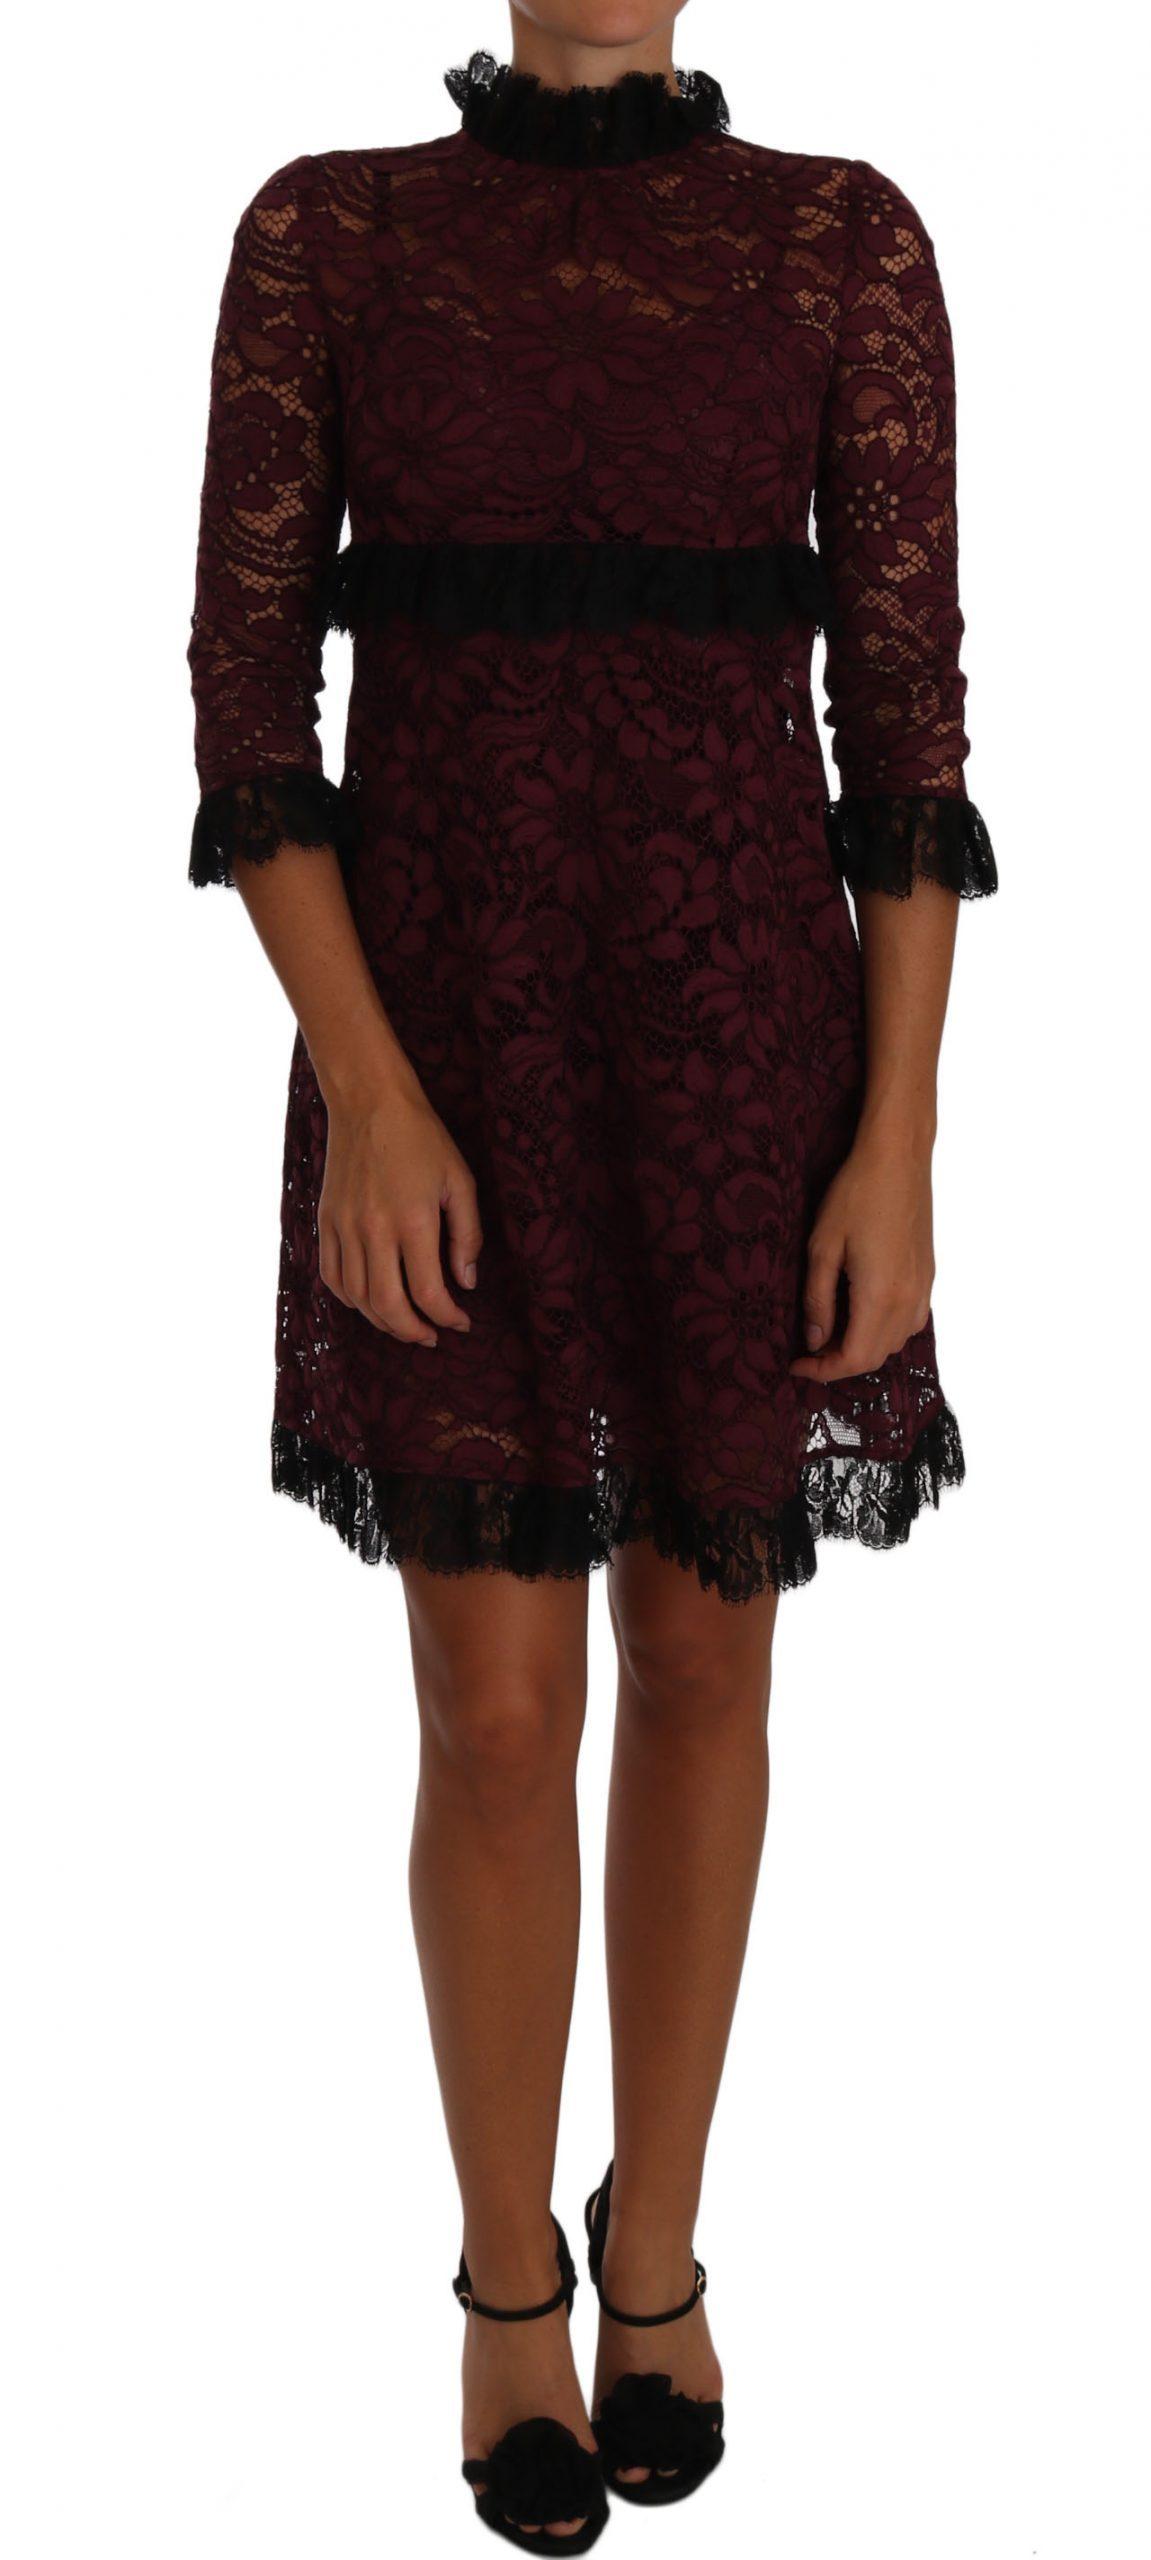 Dolce & Gabbana Women's Floral Lace Dress Black DR1440 - IT36   XS